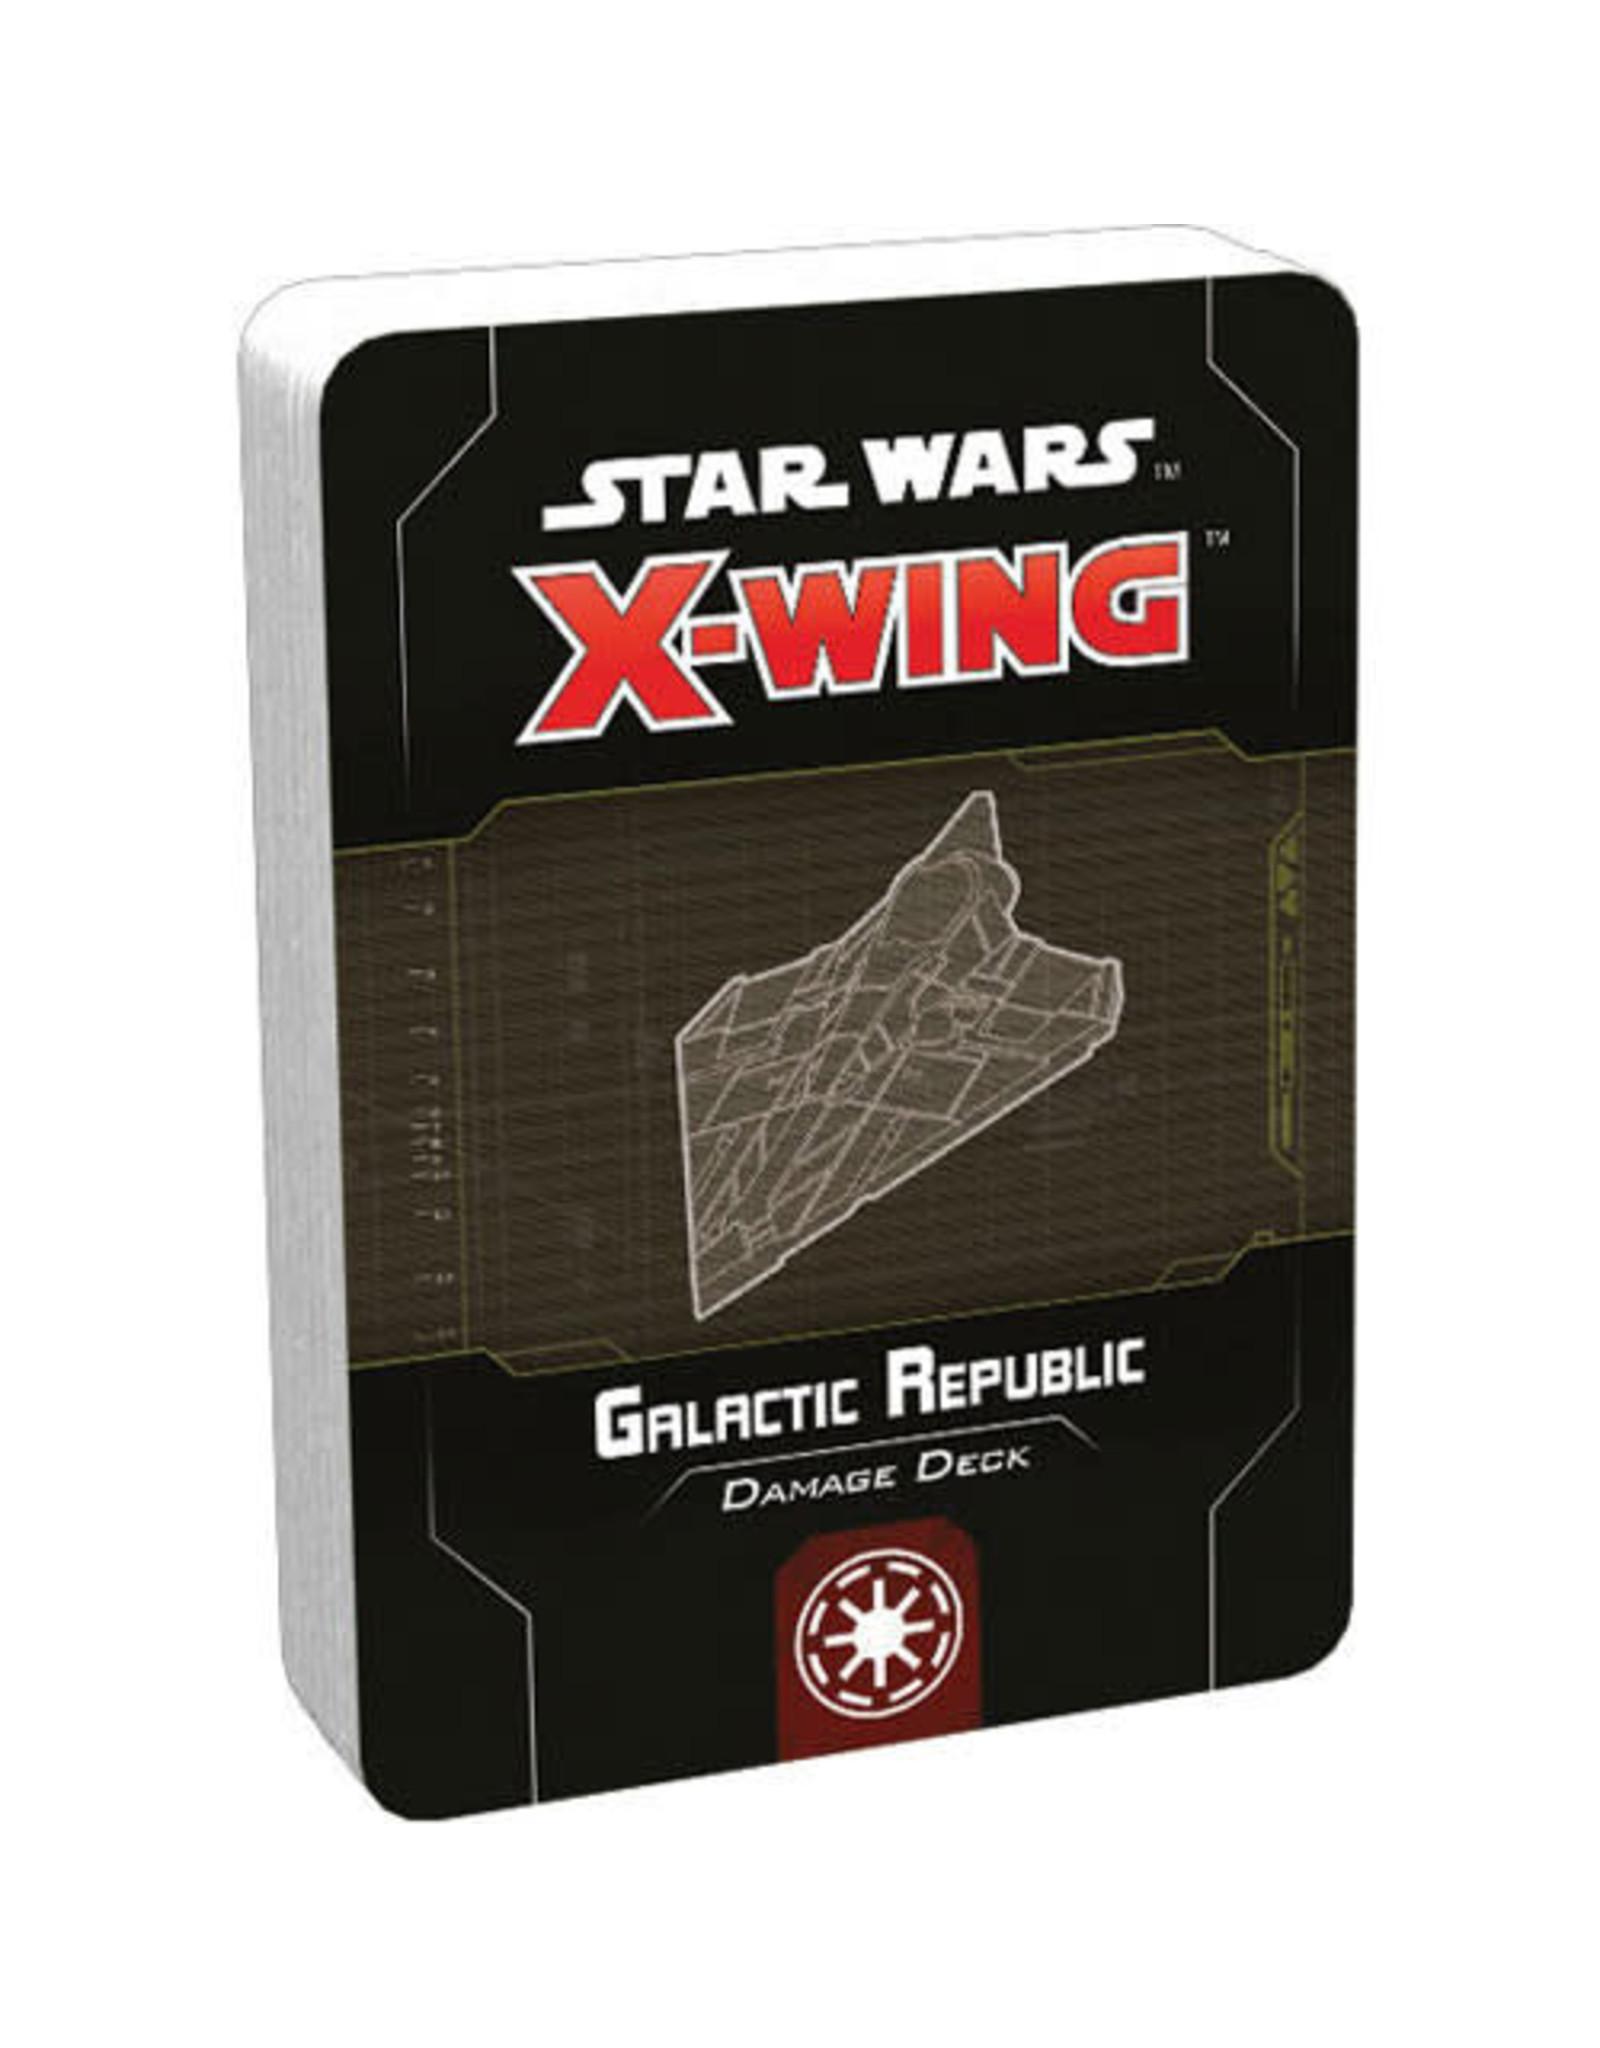 Star Wars X-Wing 2e: Galactic Republic Damage Deck